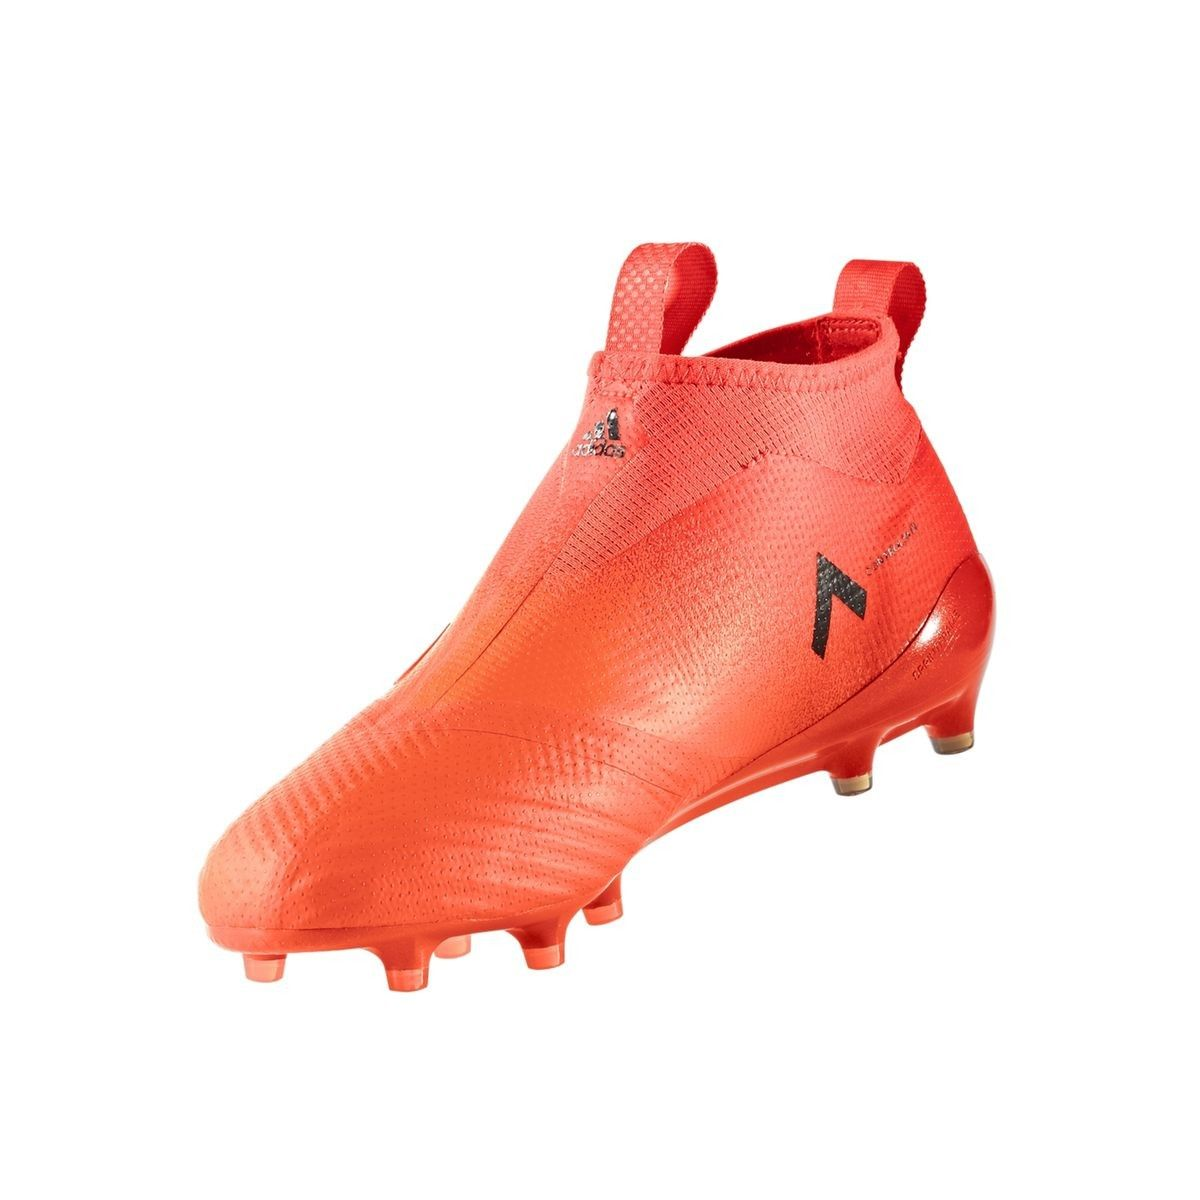 Chaussures Football Adidas Ace 17+ Purecontrol Fg Orange